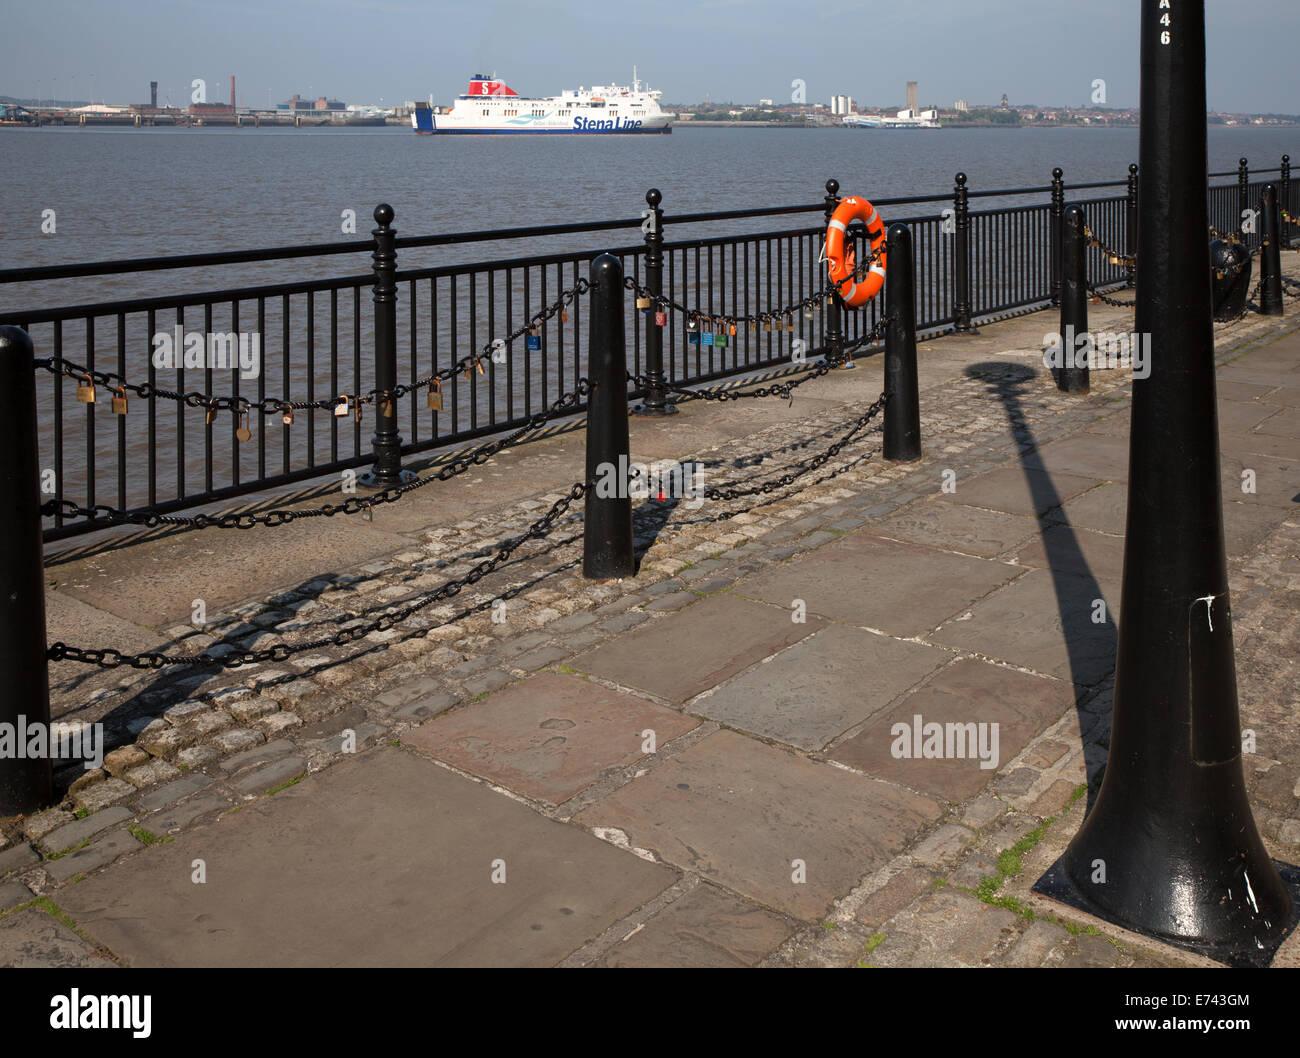 Lock of Love_Locks locked to chain on Railings seafront, River Mersey, Liverpool, Merseyside, UK - Stock Image